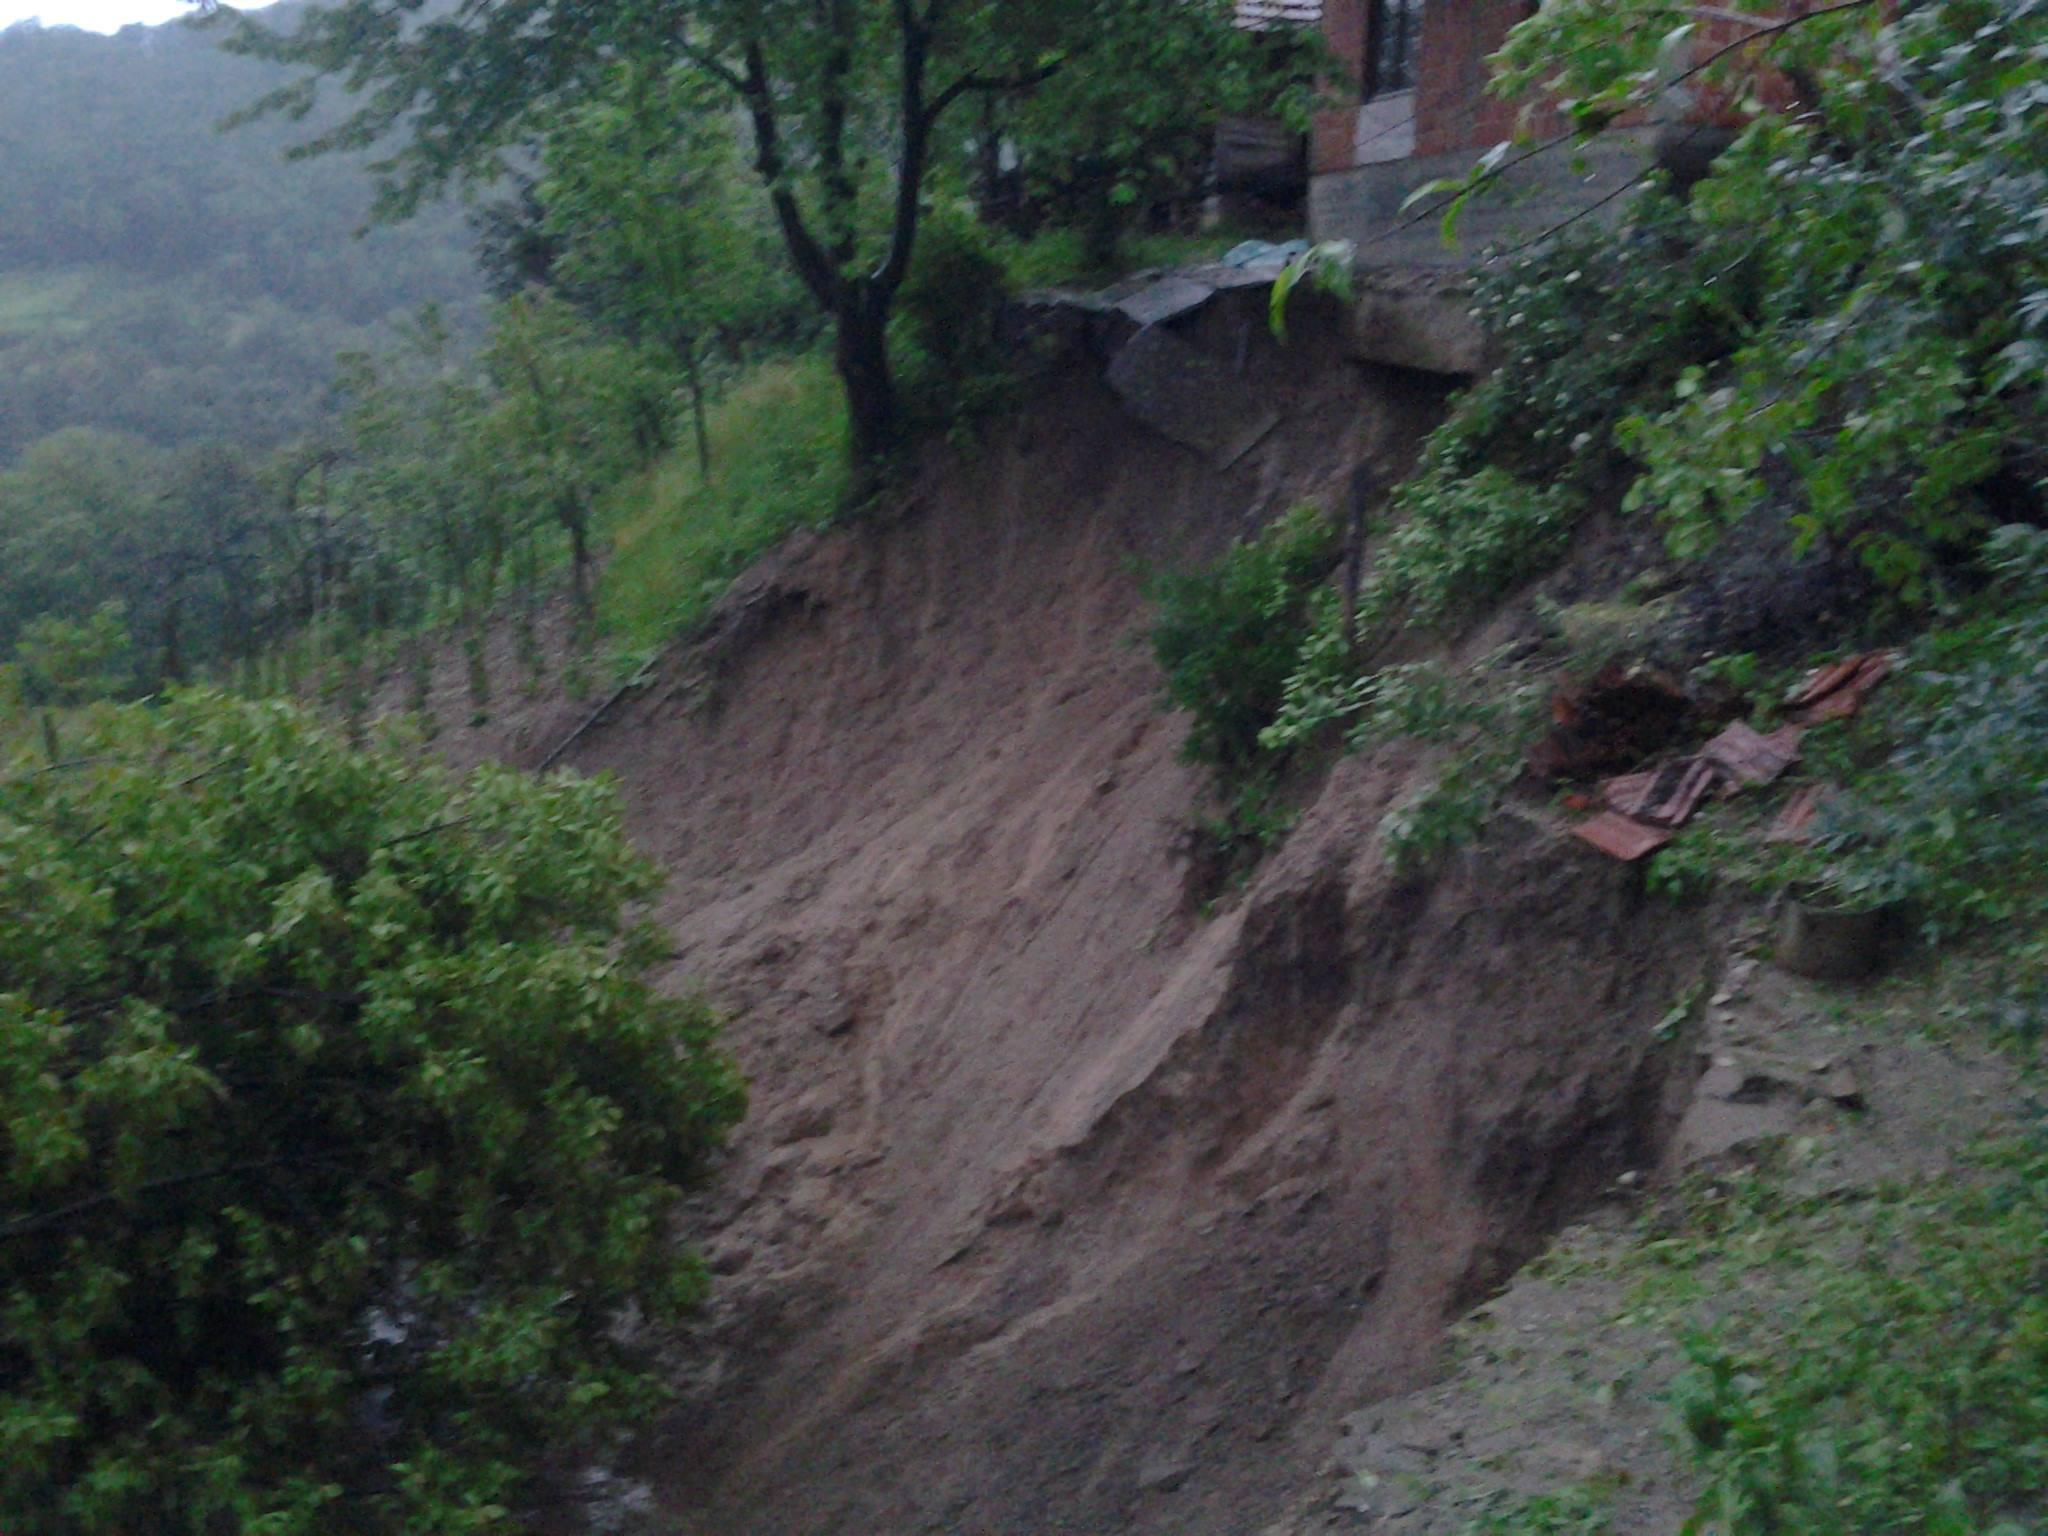 Pregedate slike iz ?lanka: Katastrofalne poplave i klizi�ta